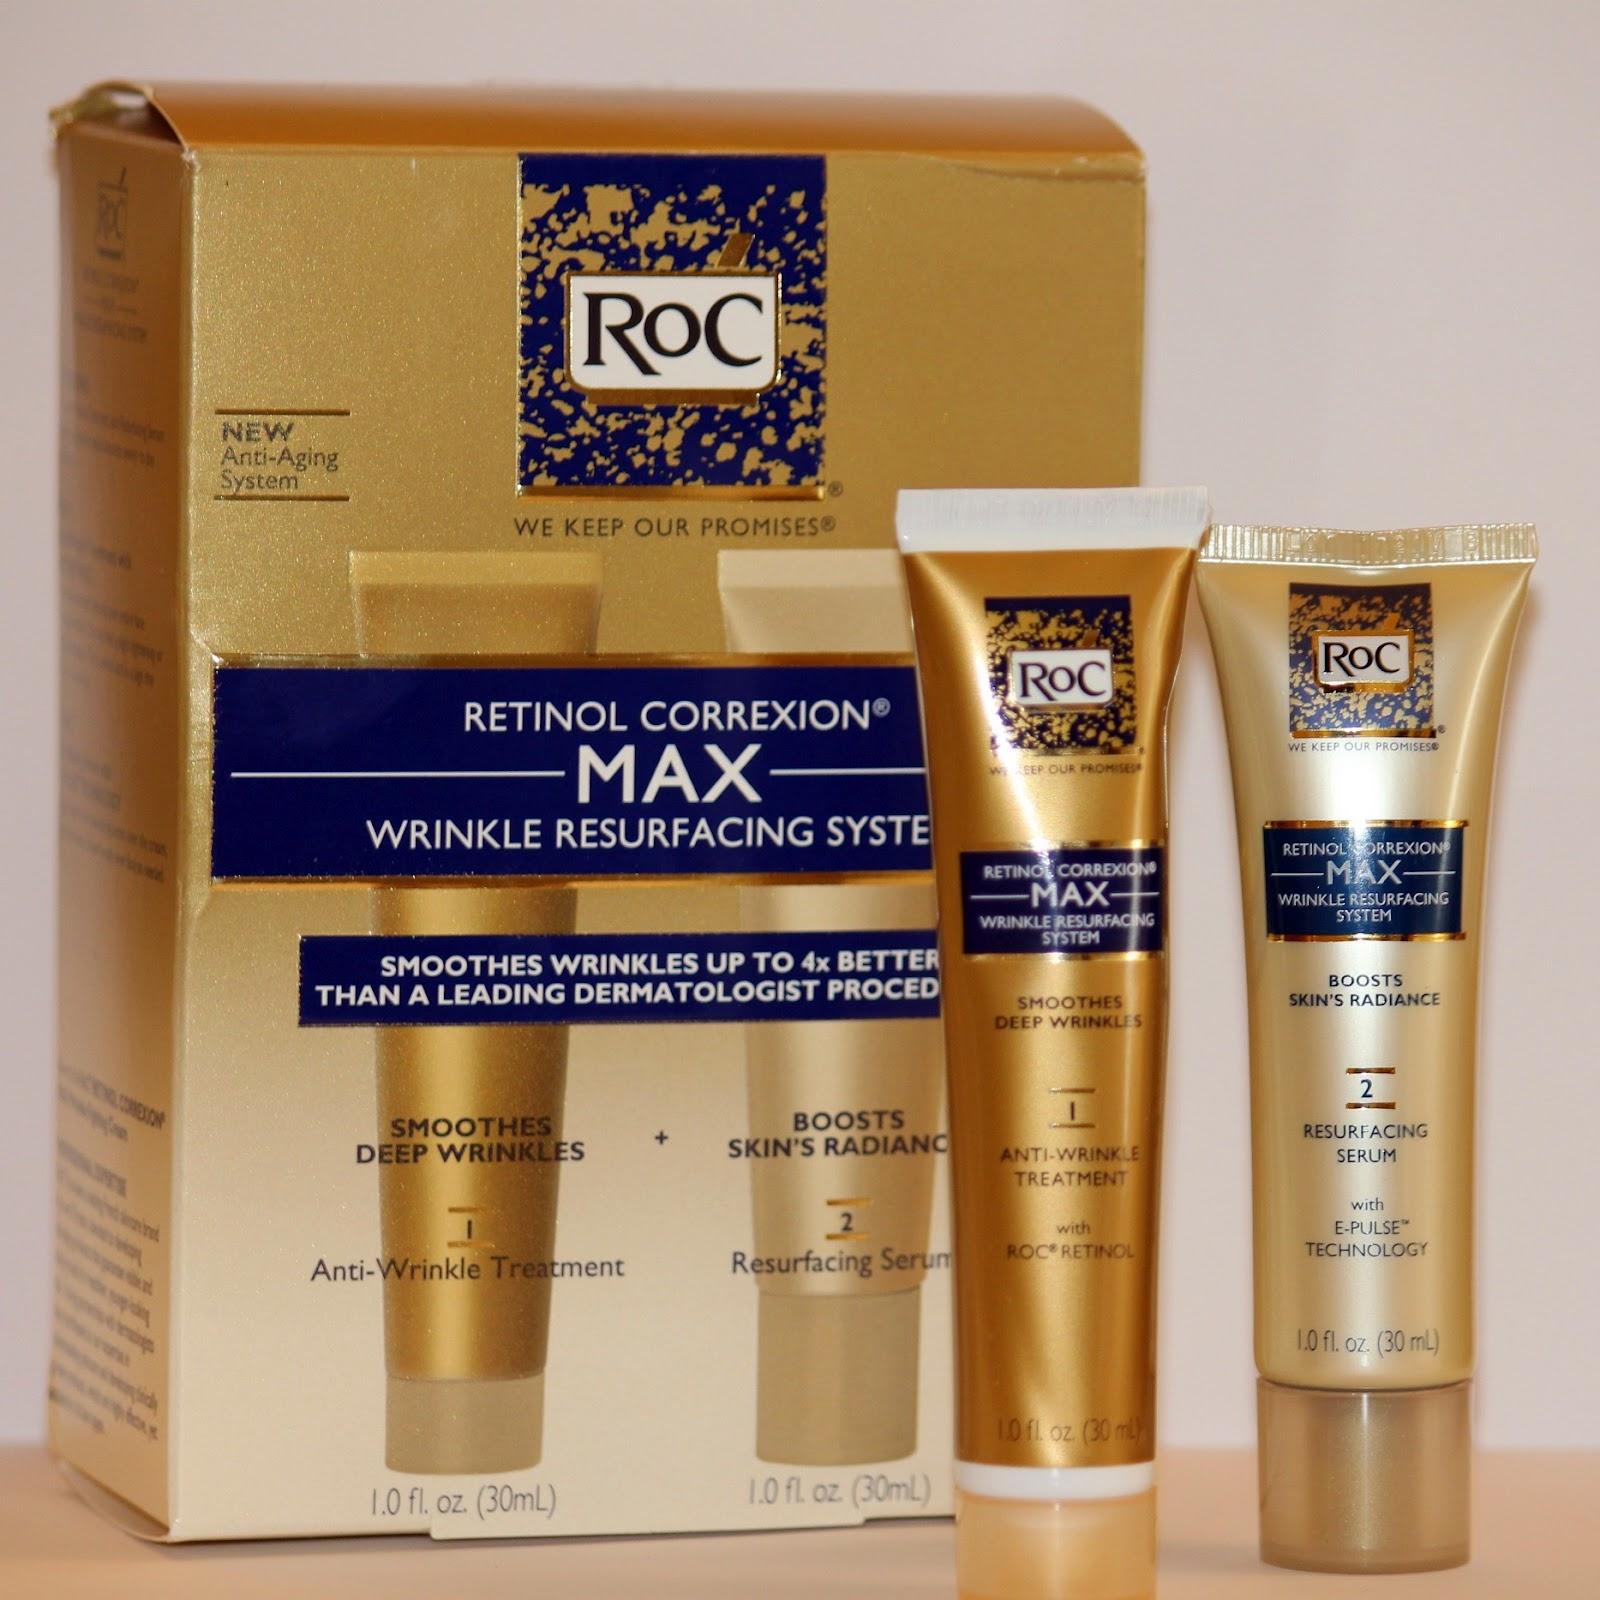 Blushing Basics Roc Skincare Review